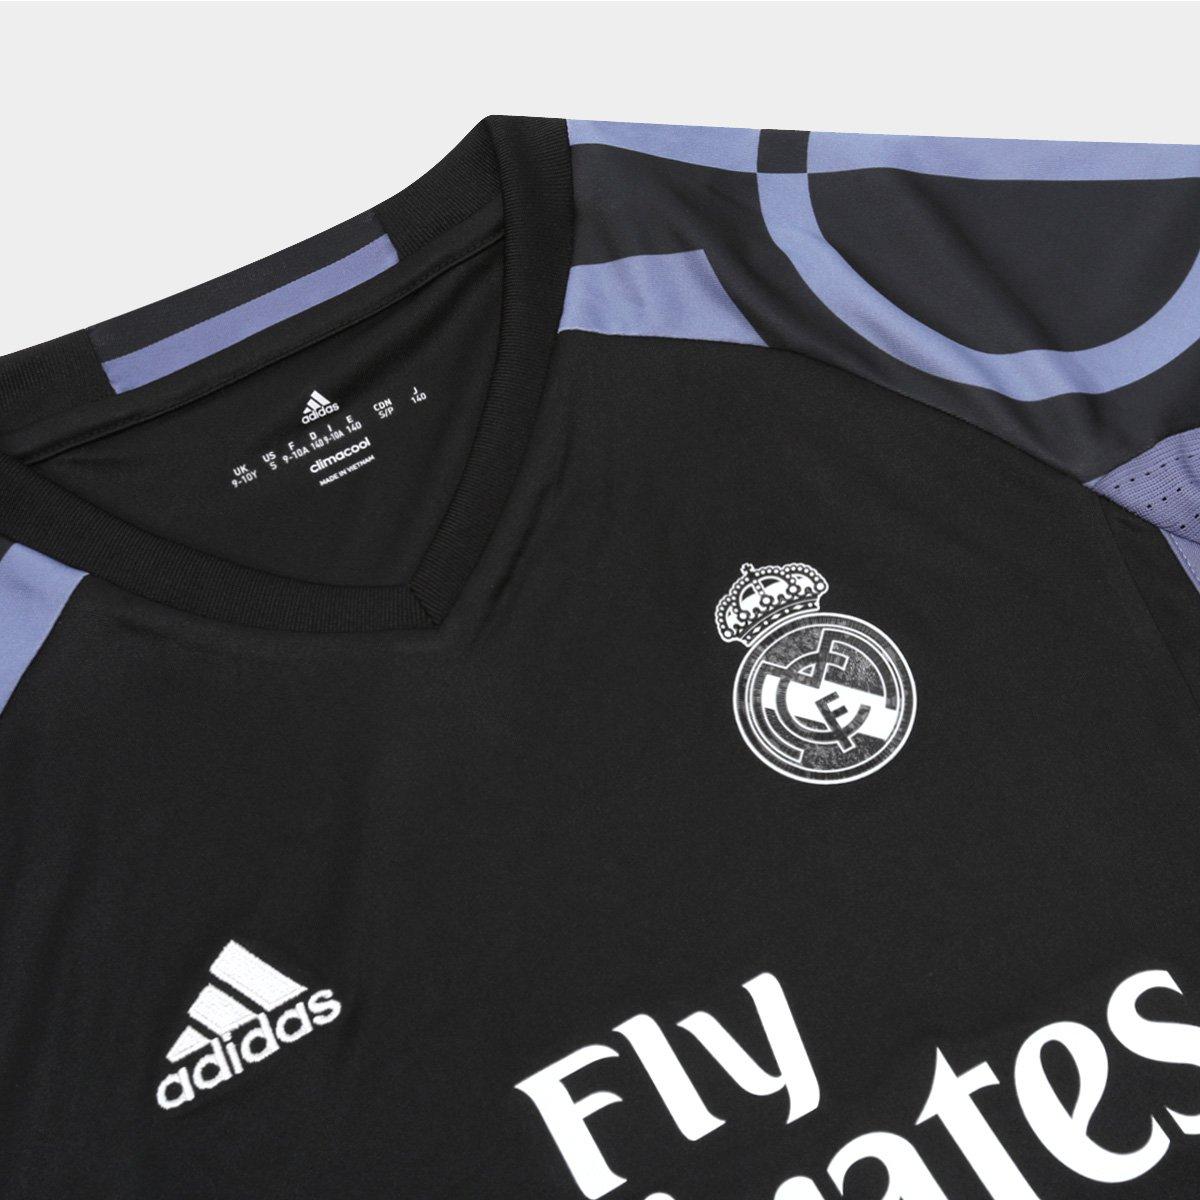 ... Preto Madrid Third Adidas Real Roxo Camisa nº 17 s Torcedor e 16  Infantil 15vxzq ... adab7da453c6f